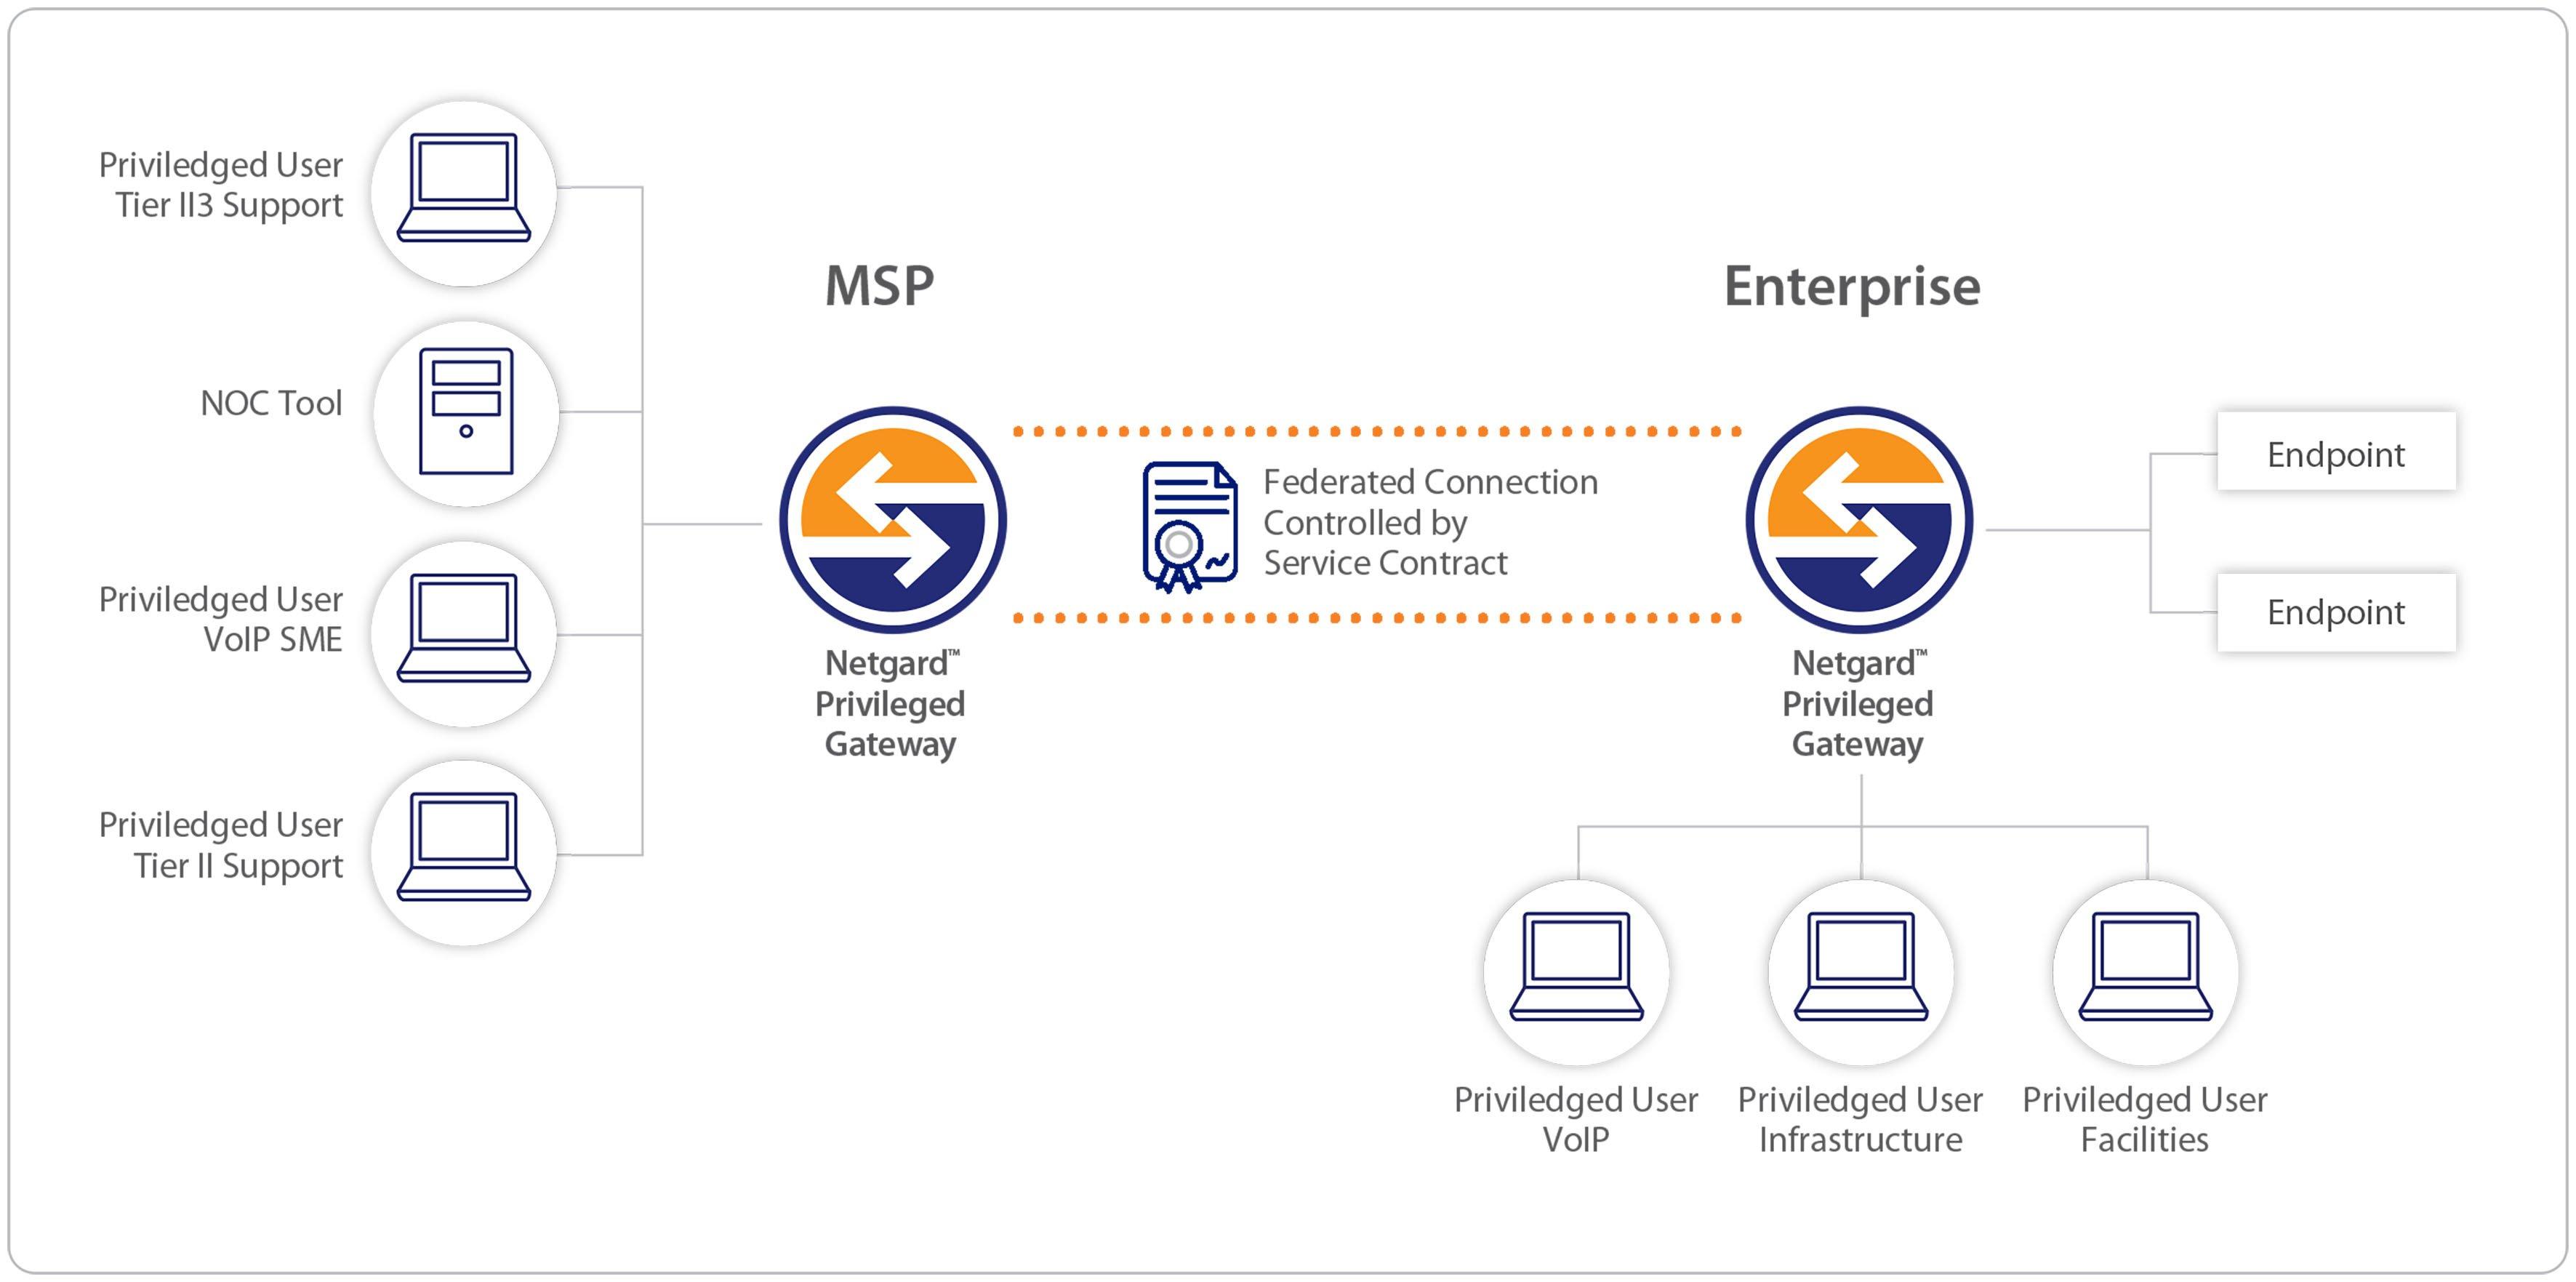 NPG diagram 2